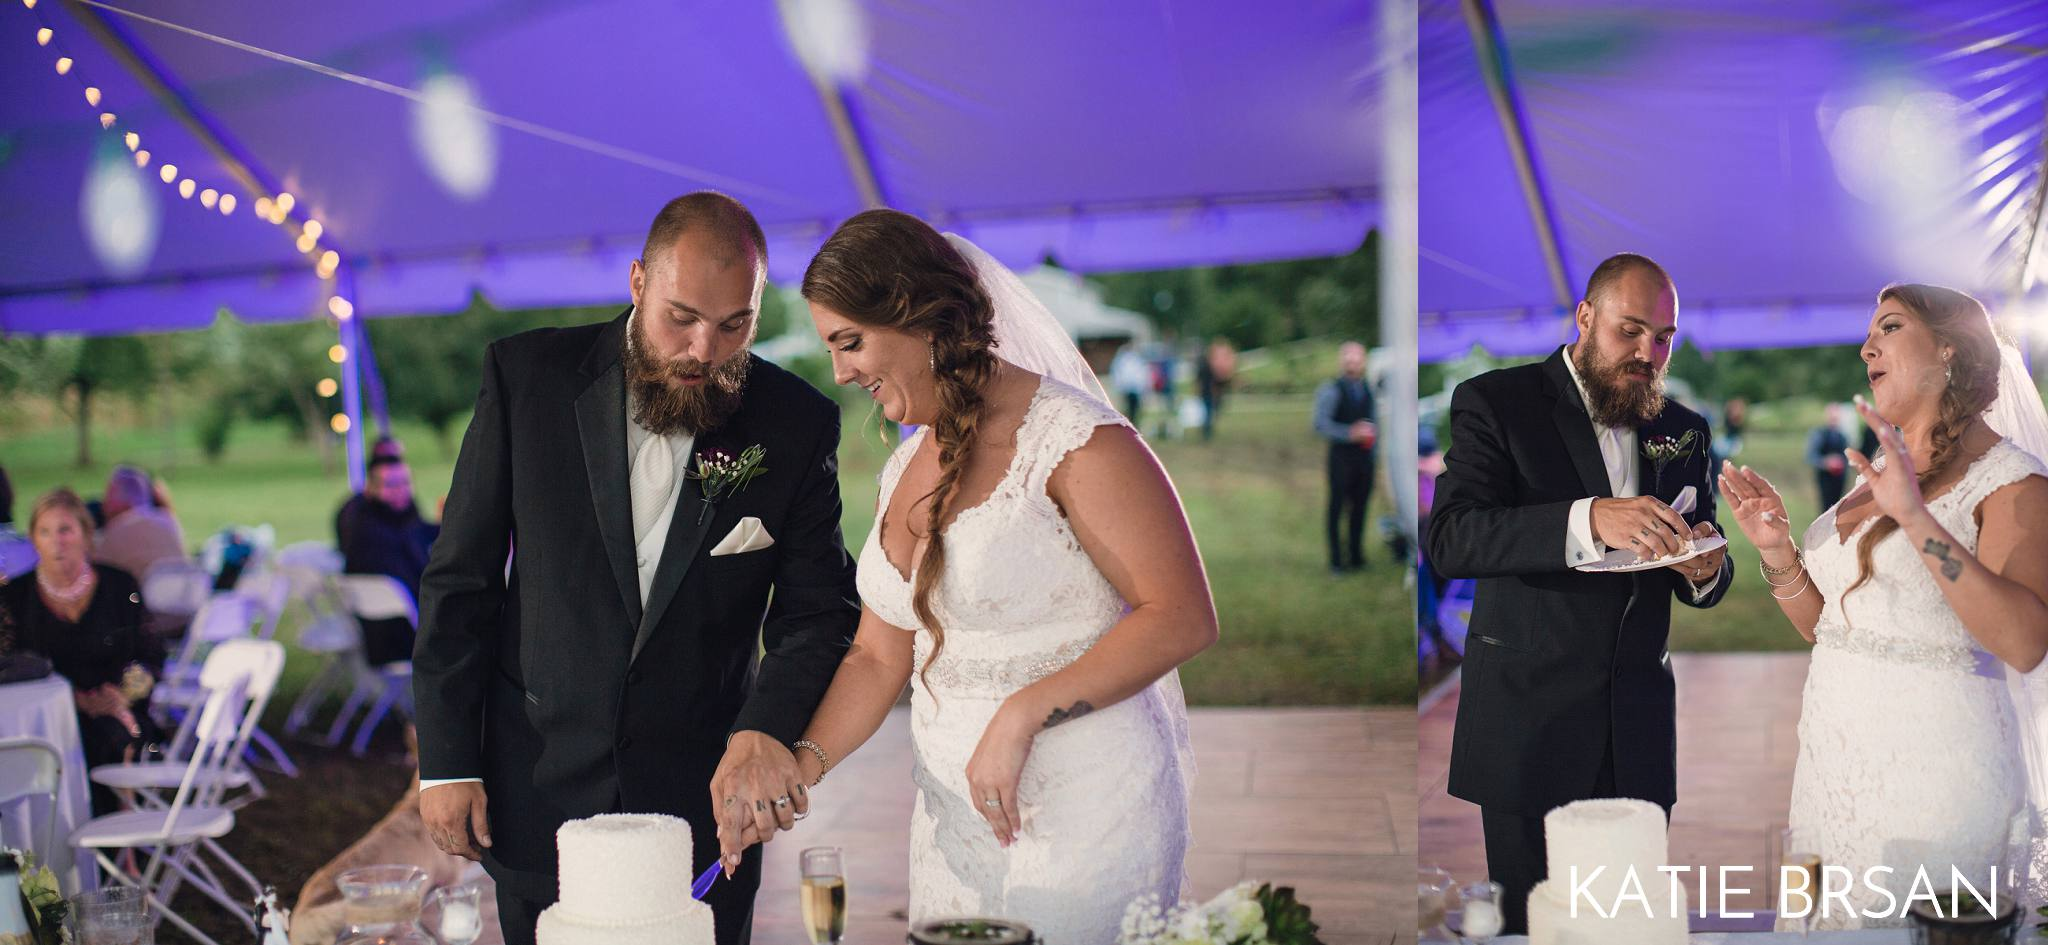 KatieBrsan-Bonfield-Backyard-Wedding_0428.jpg